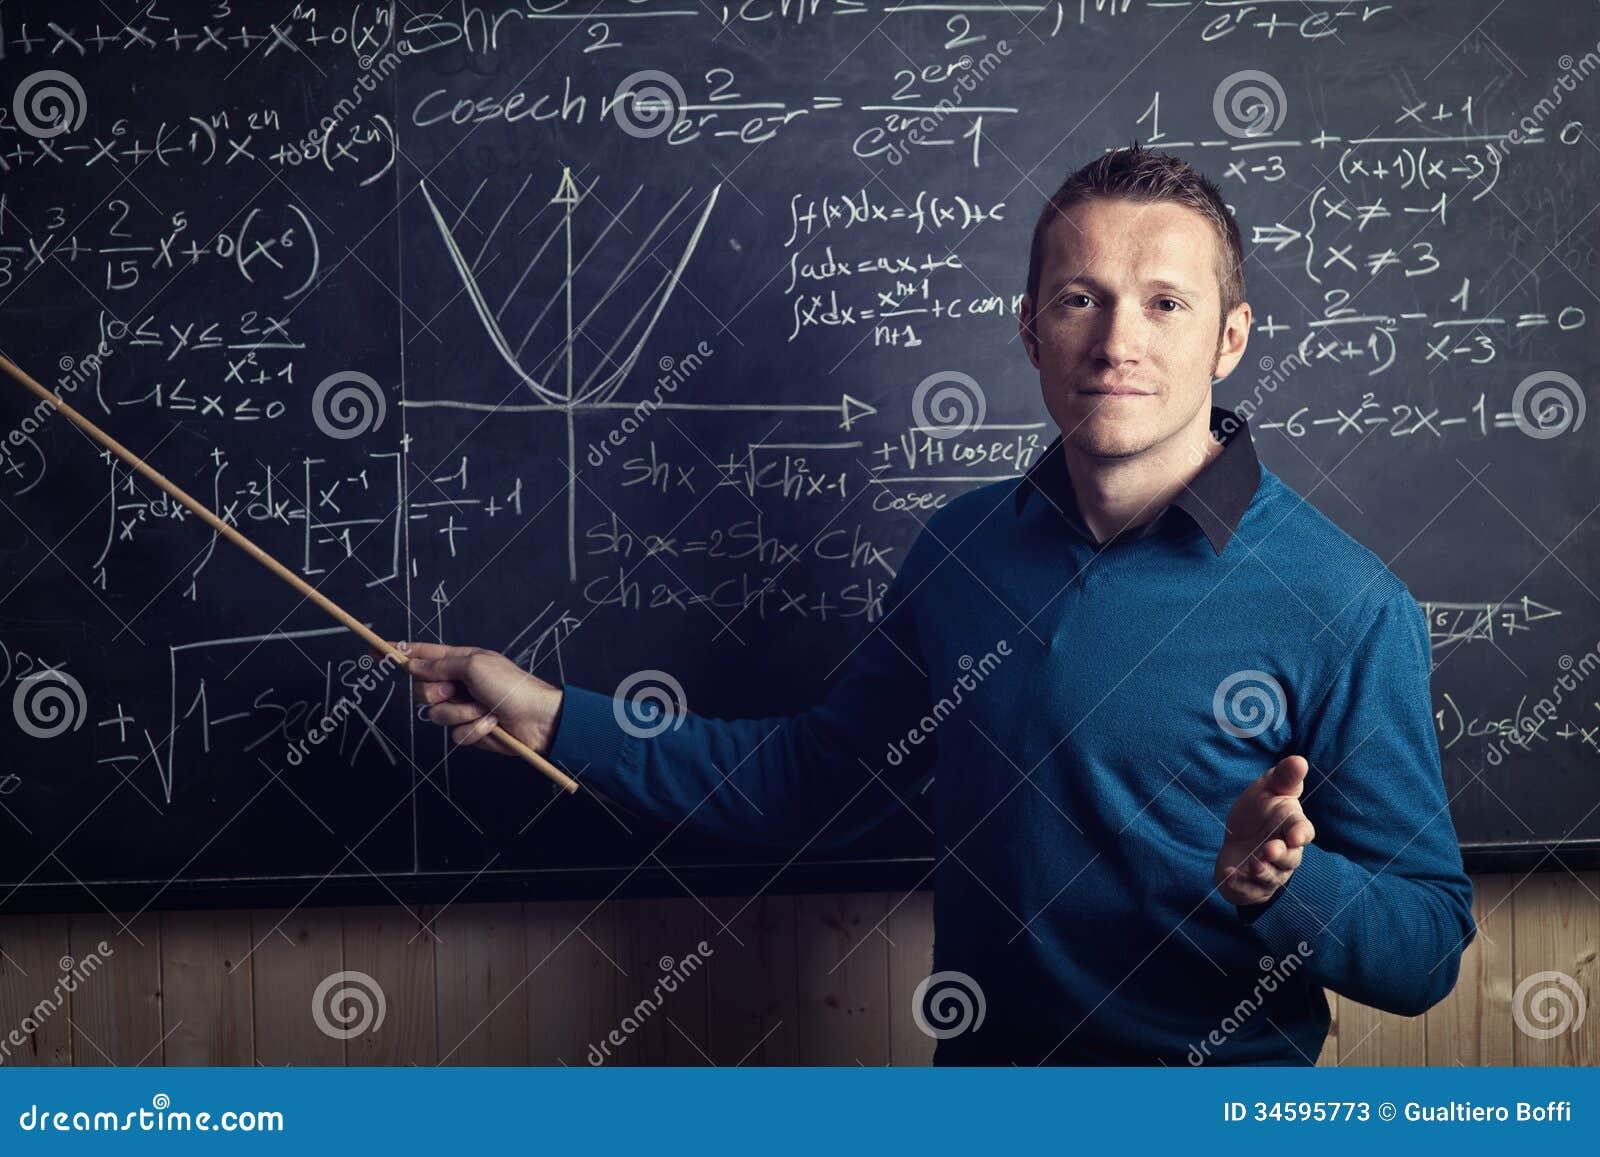 Teacher at work stock image. Image of math, chalkboard ...